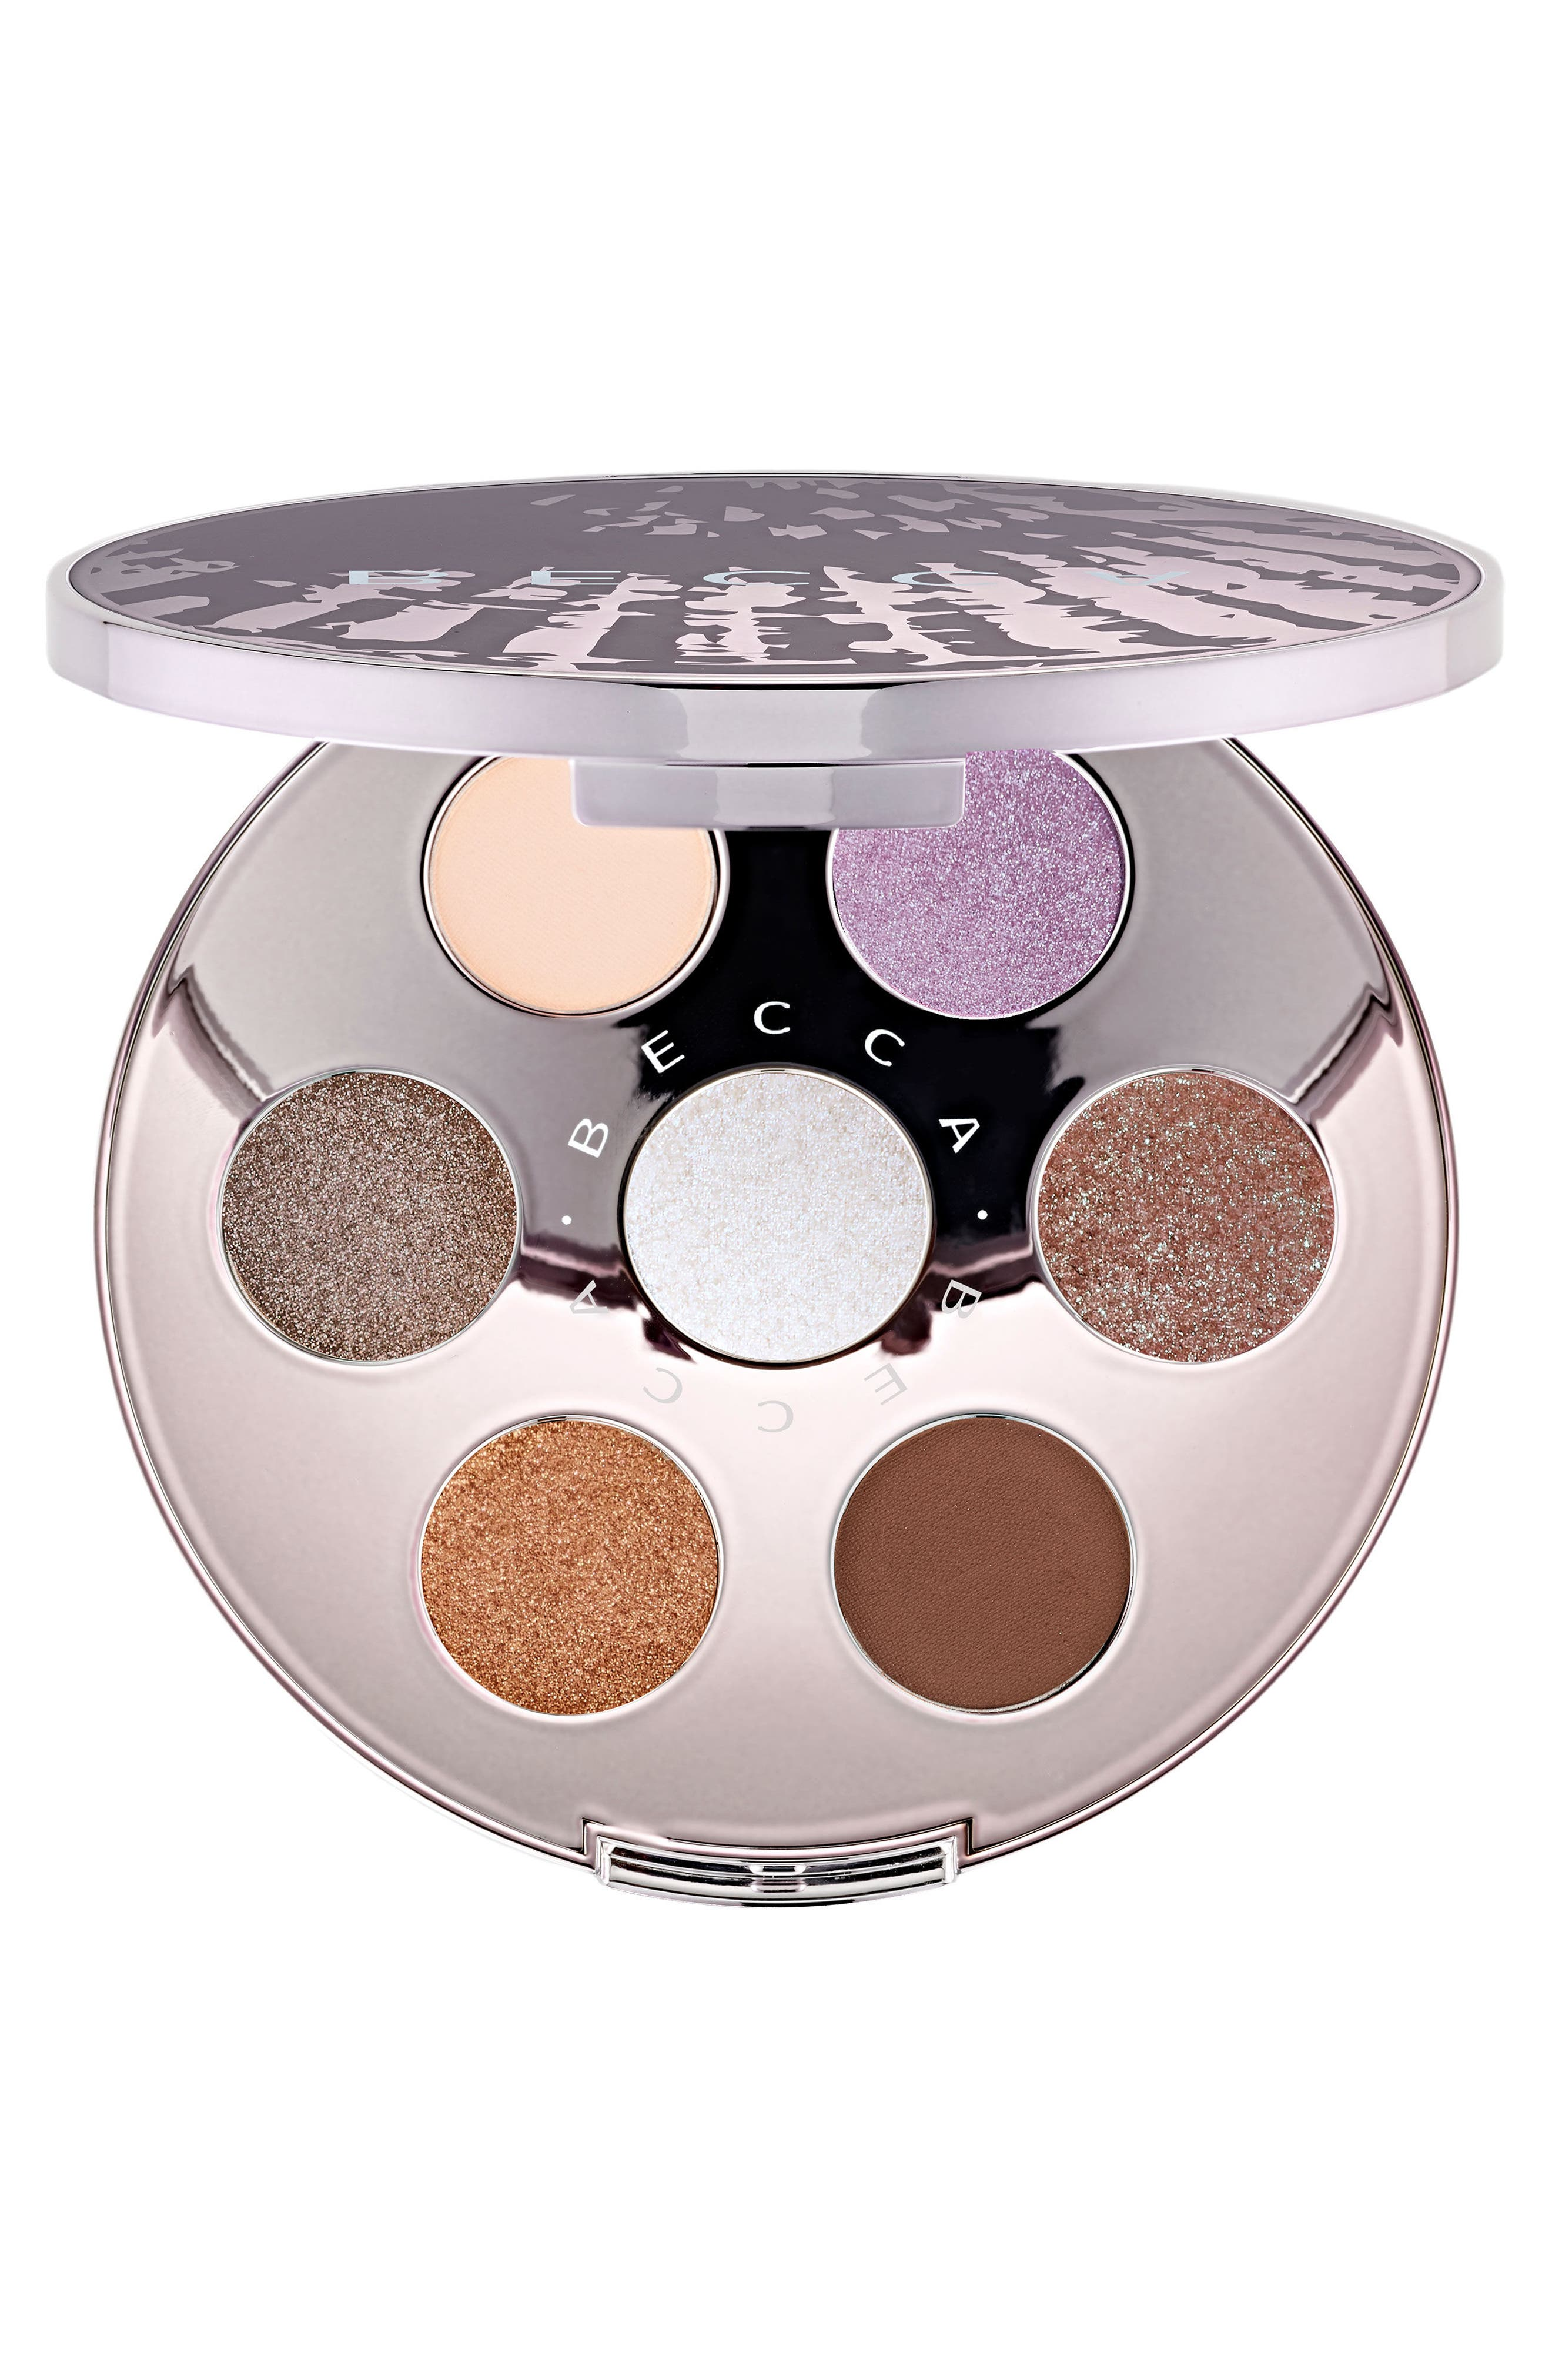 BECCA Ocean Jewels Eyeshadow Palette,                             Main thumbnail 1, color,                             000